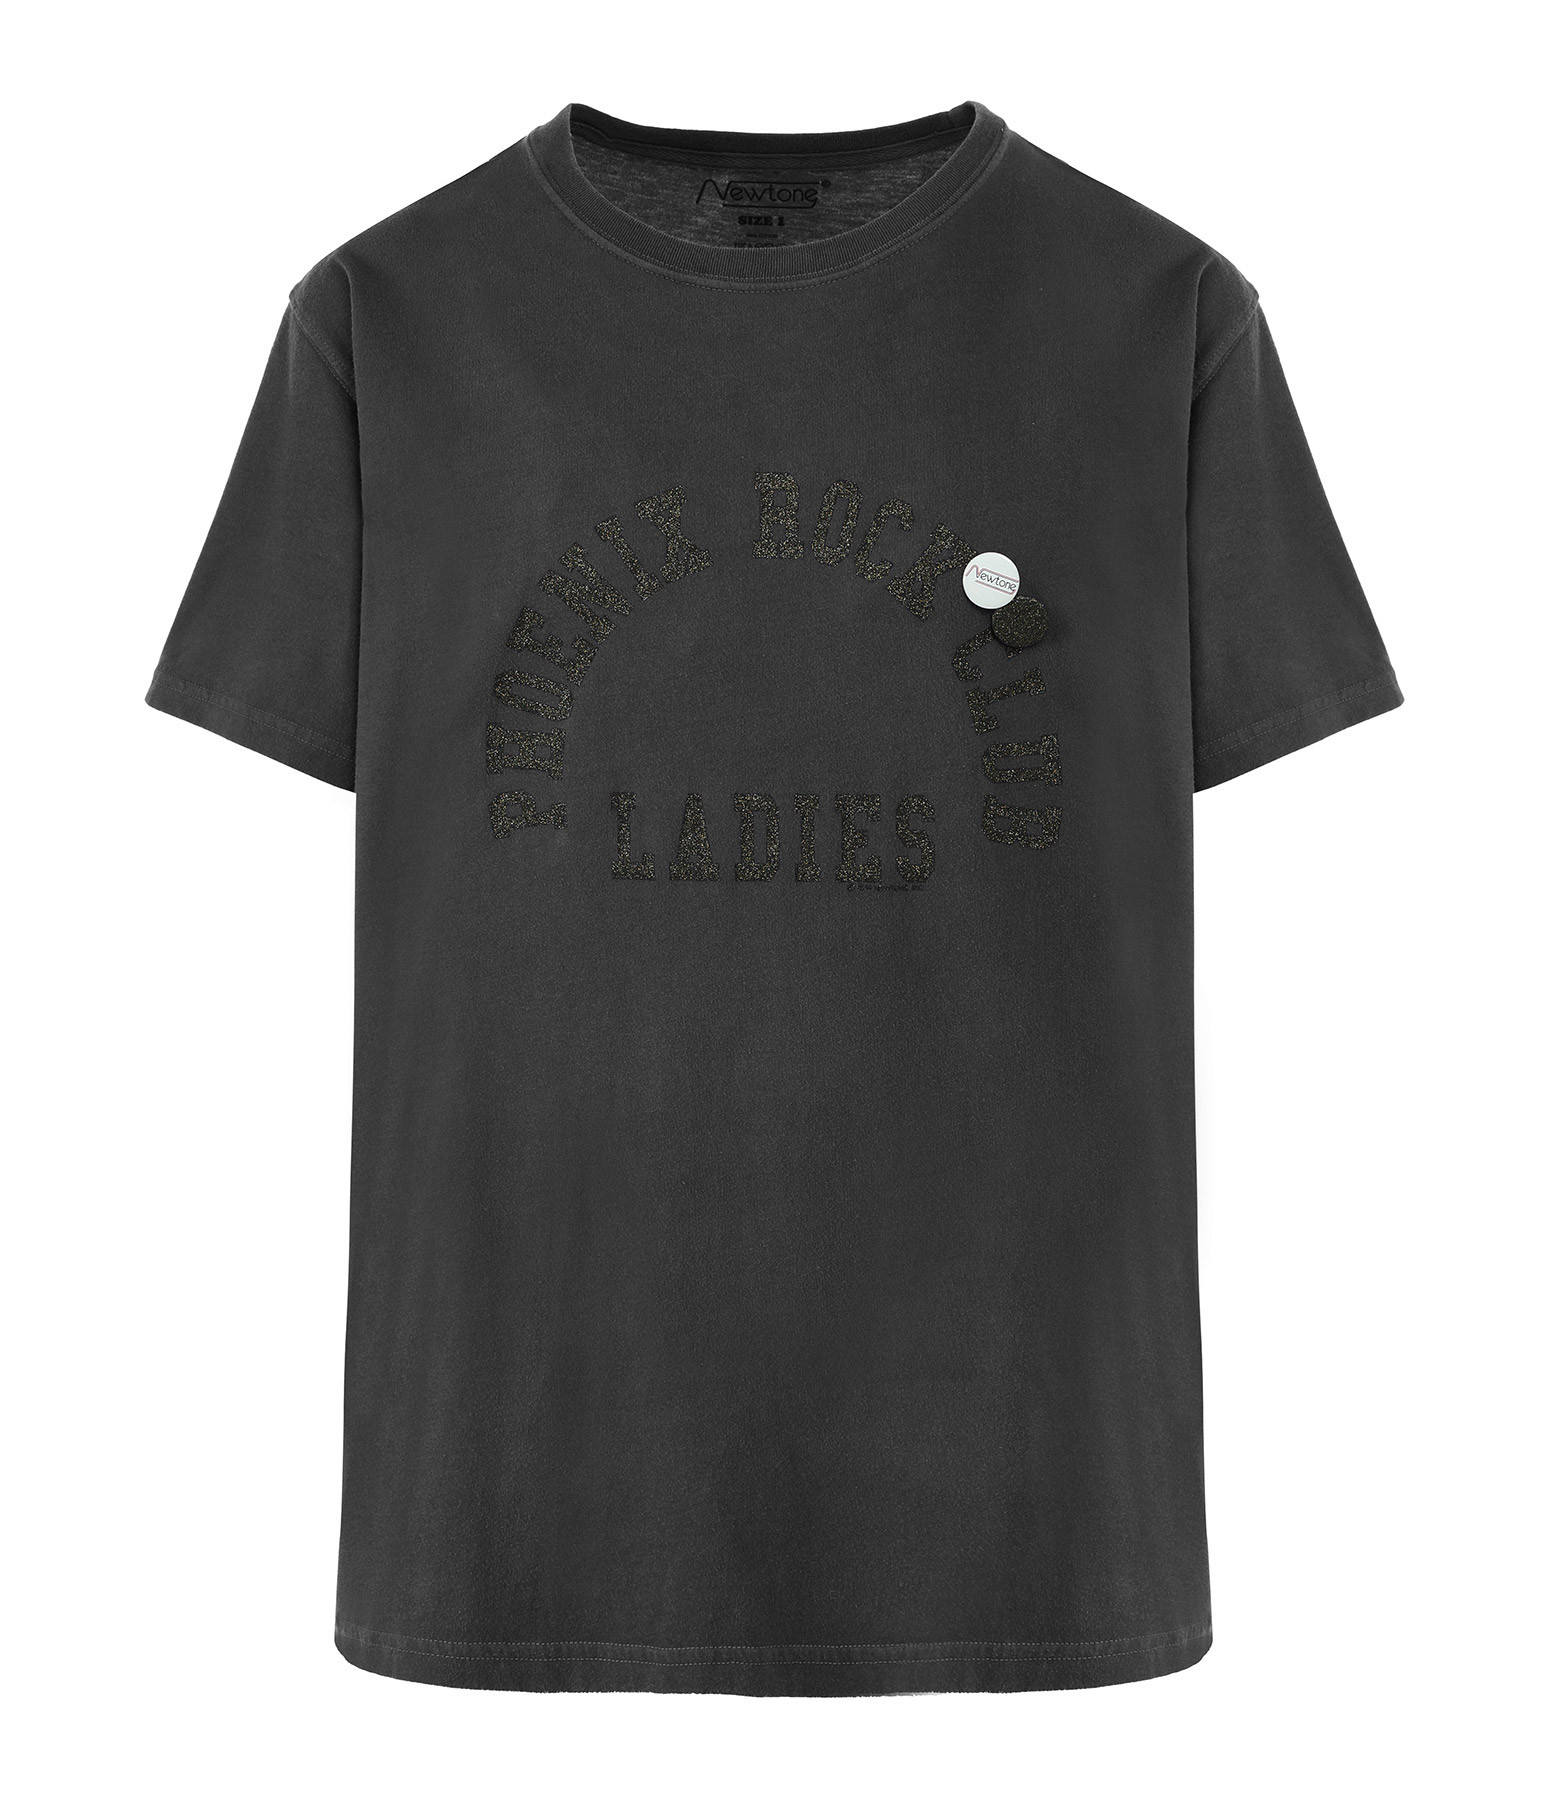 NEWTONE - Tee-shirt Phoenix Fit Trucker Coton Pepper